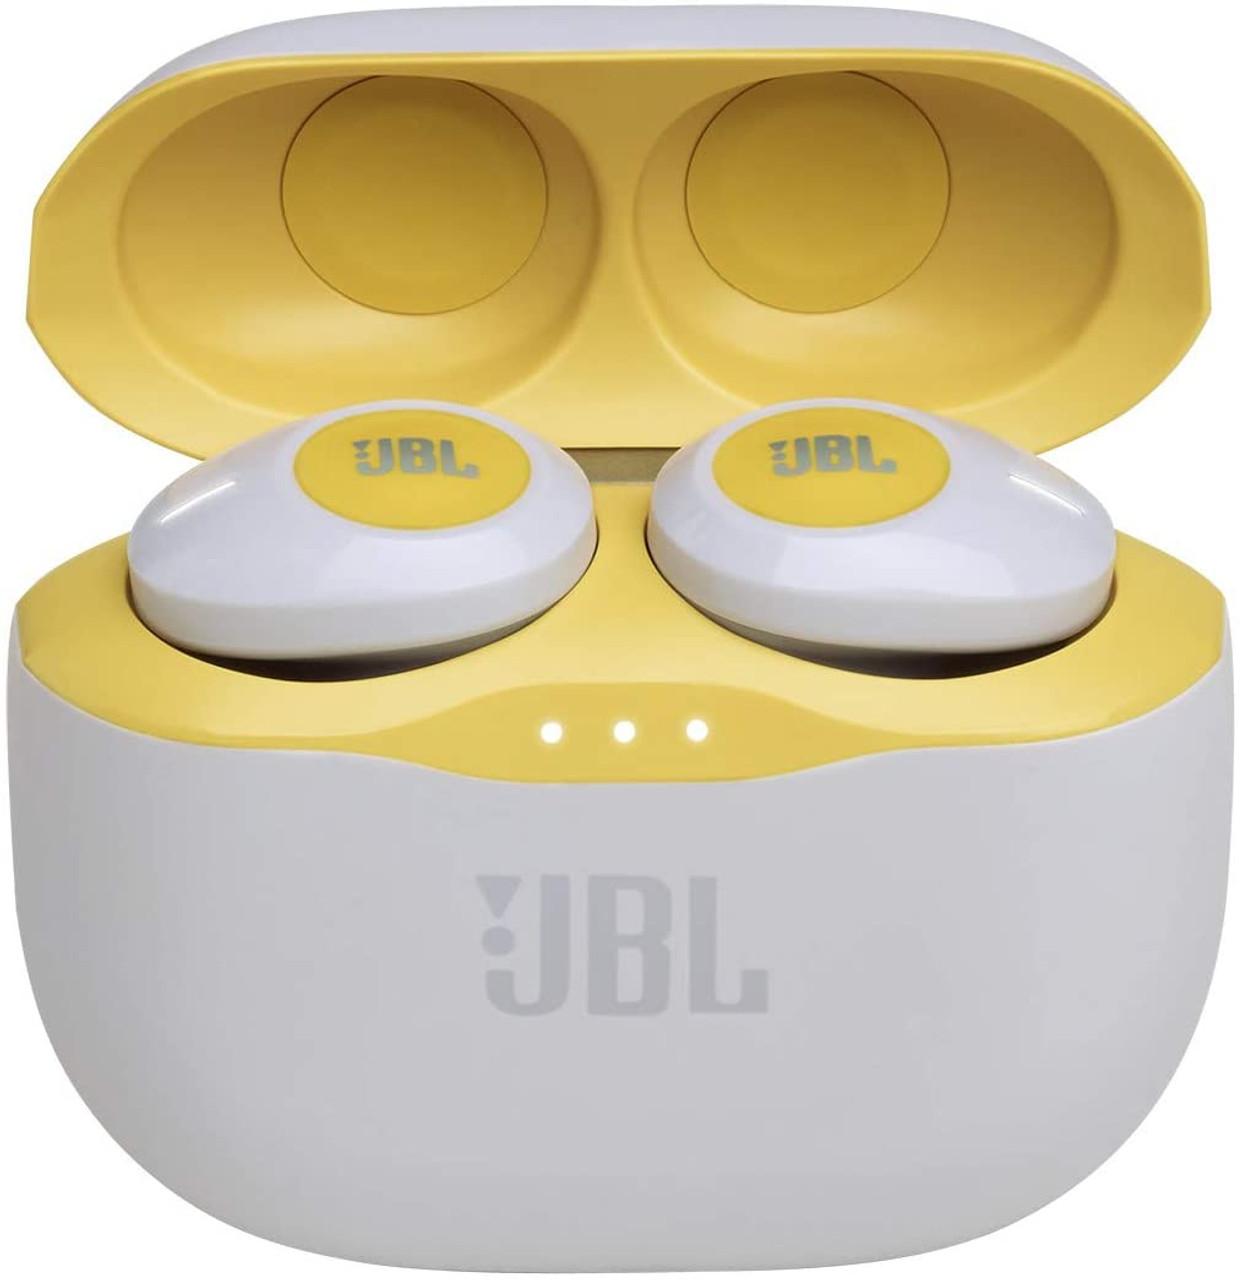 JBL JBLT120TWSYELAM-Z TUNE Wireless Headphones- 120TWS, Yellow- Certified Refurbished